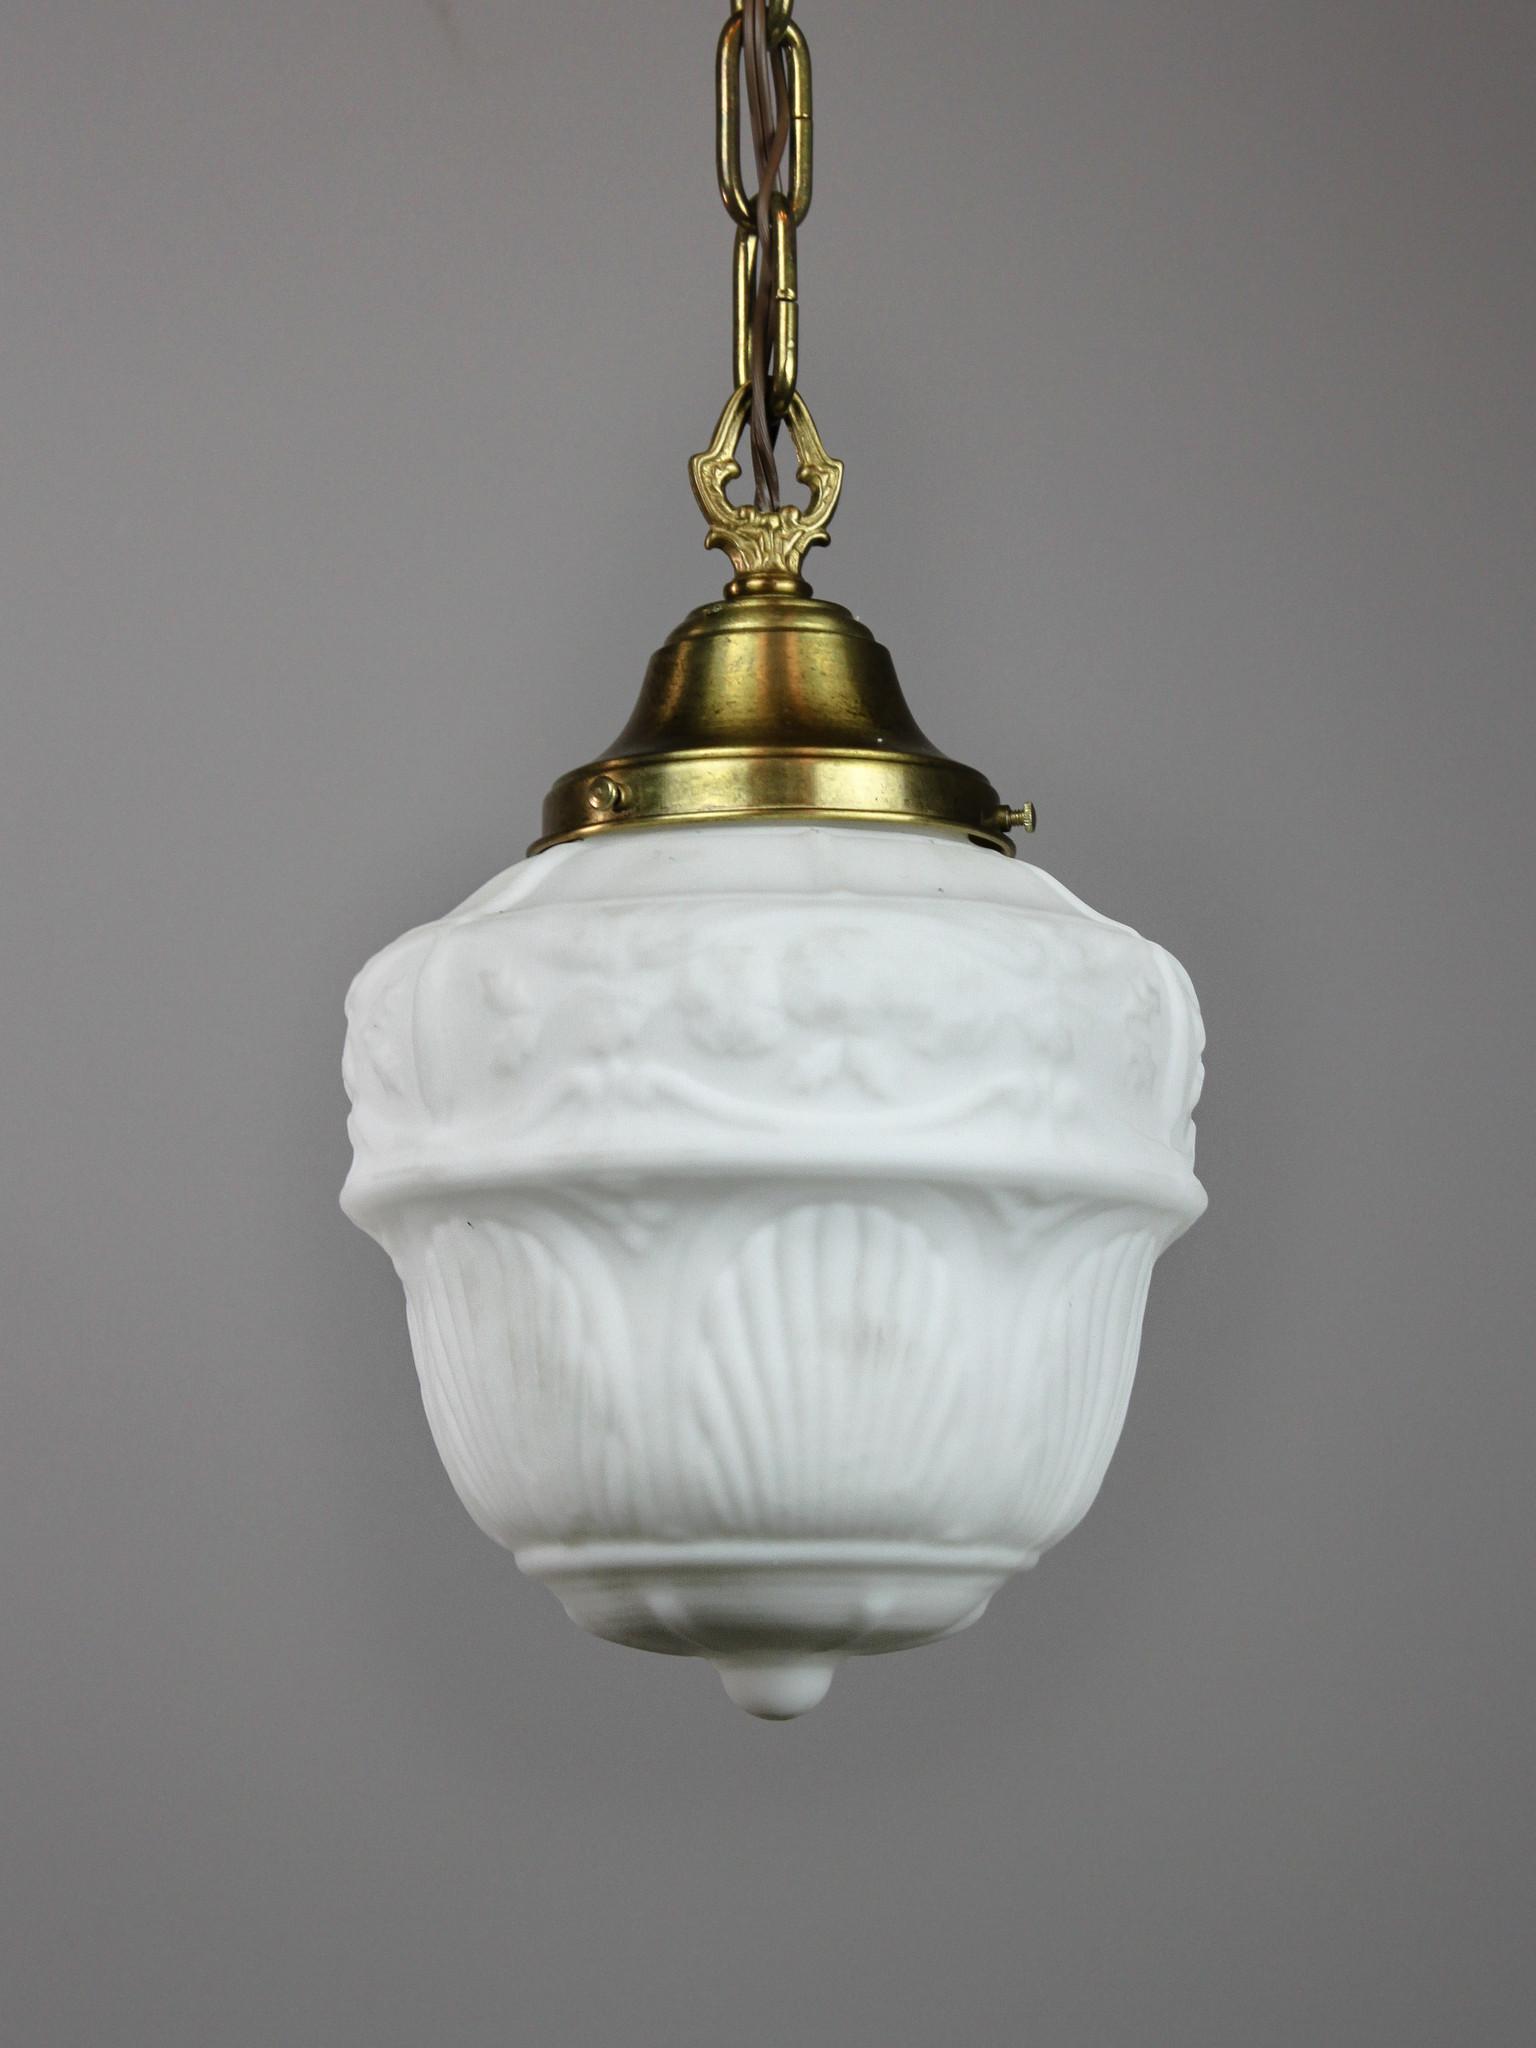 Acorn Pendant Light Fixture Renew Gallery